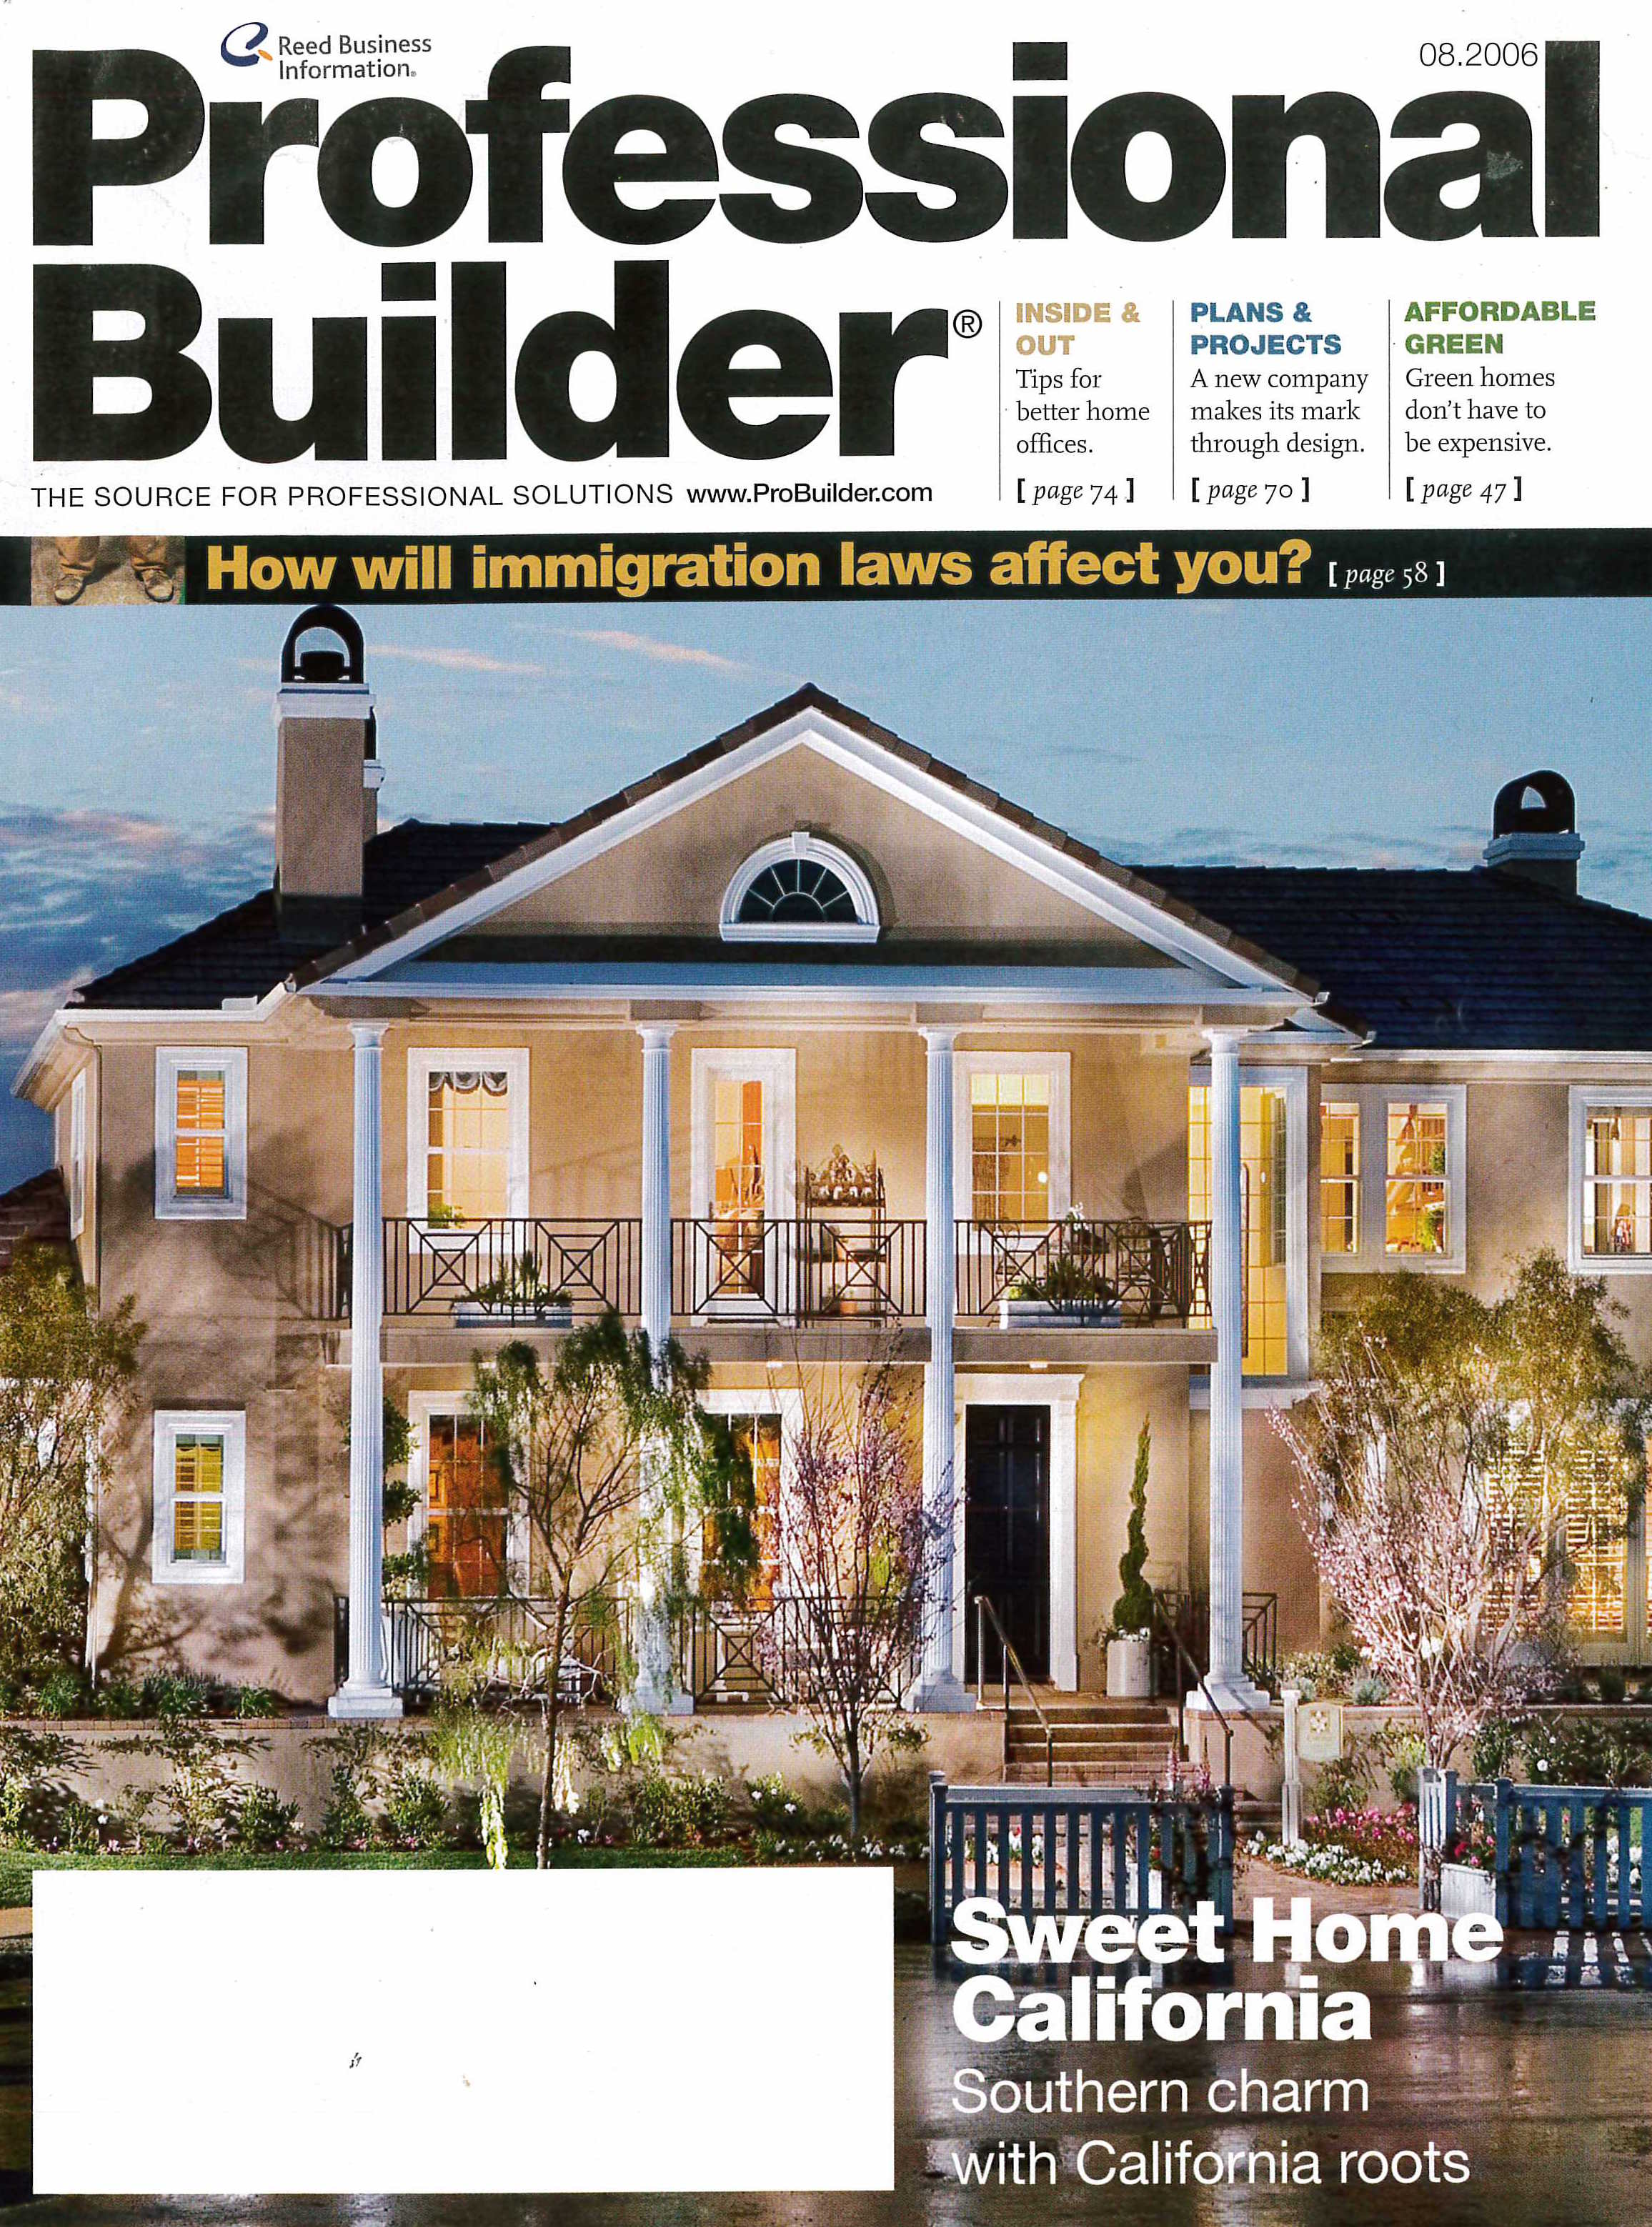 bb49b-professional-builder-cover.jpg